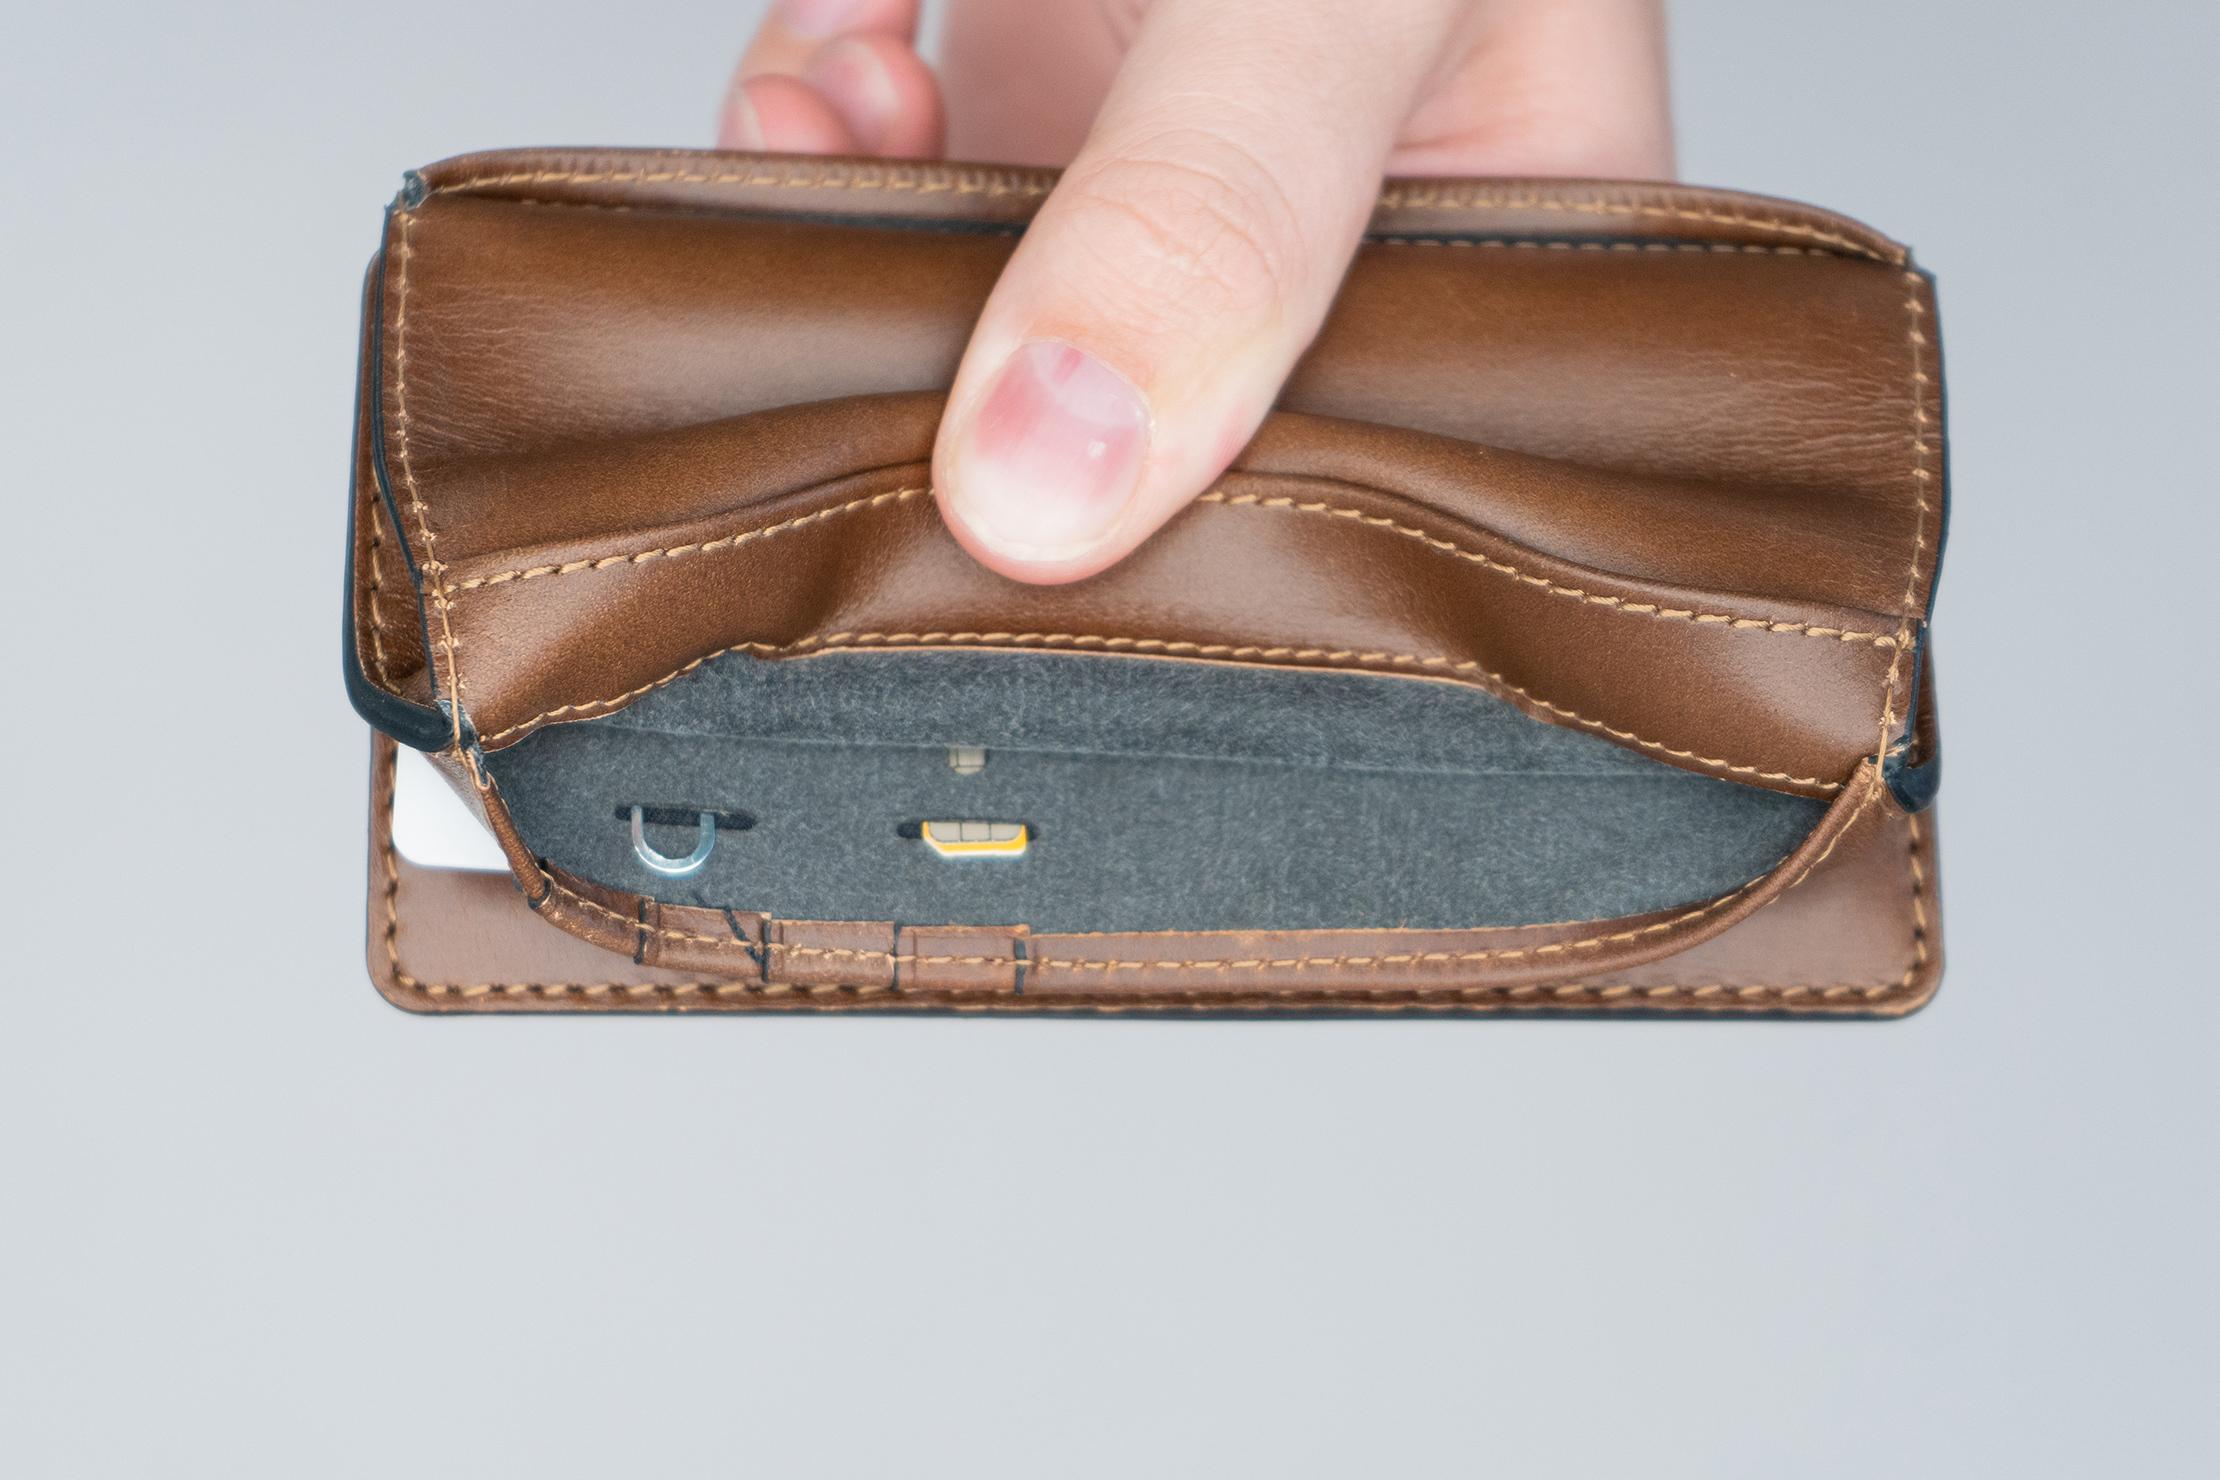 Nomad Goods Traditional Passport Wallet SIM Card 1